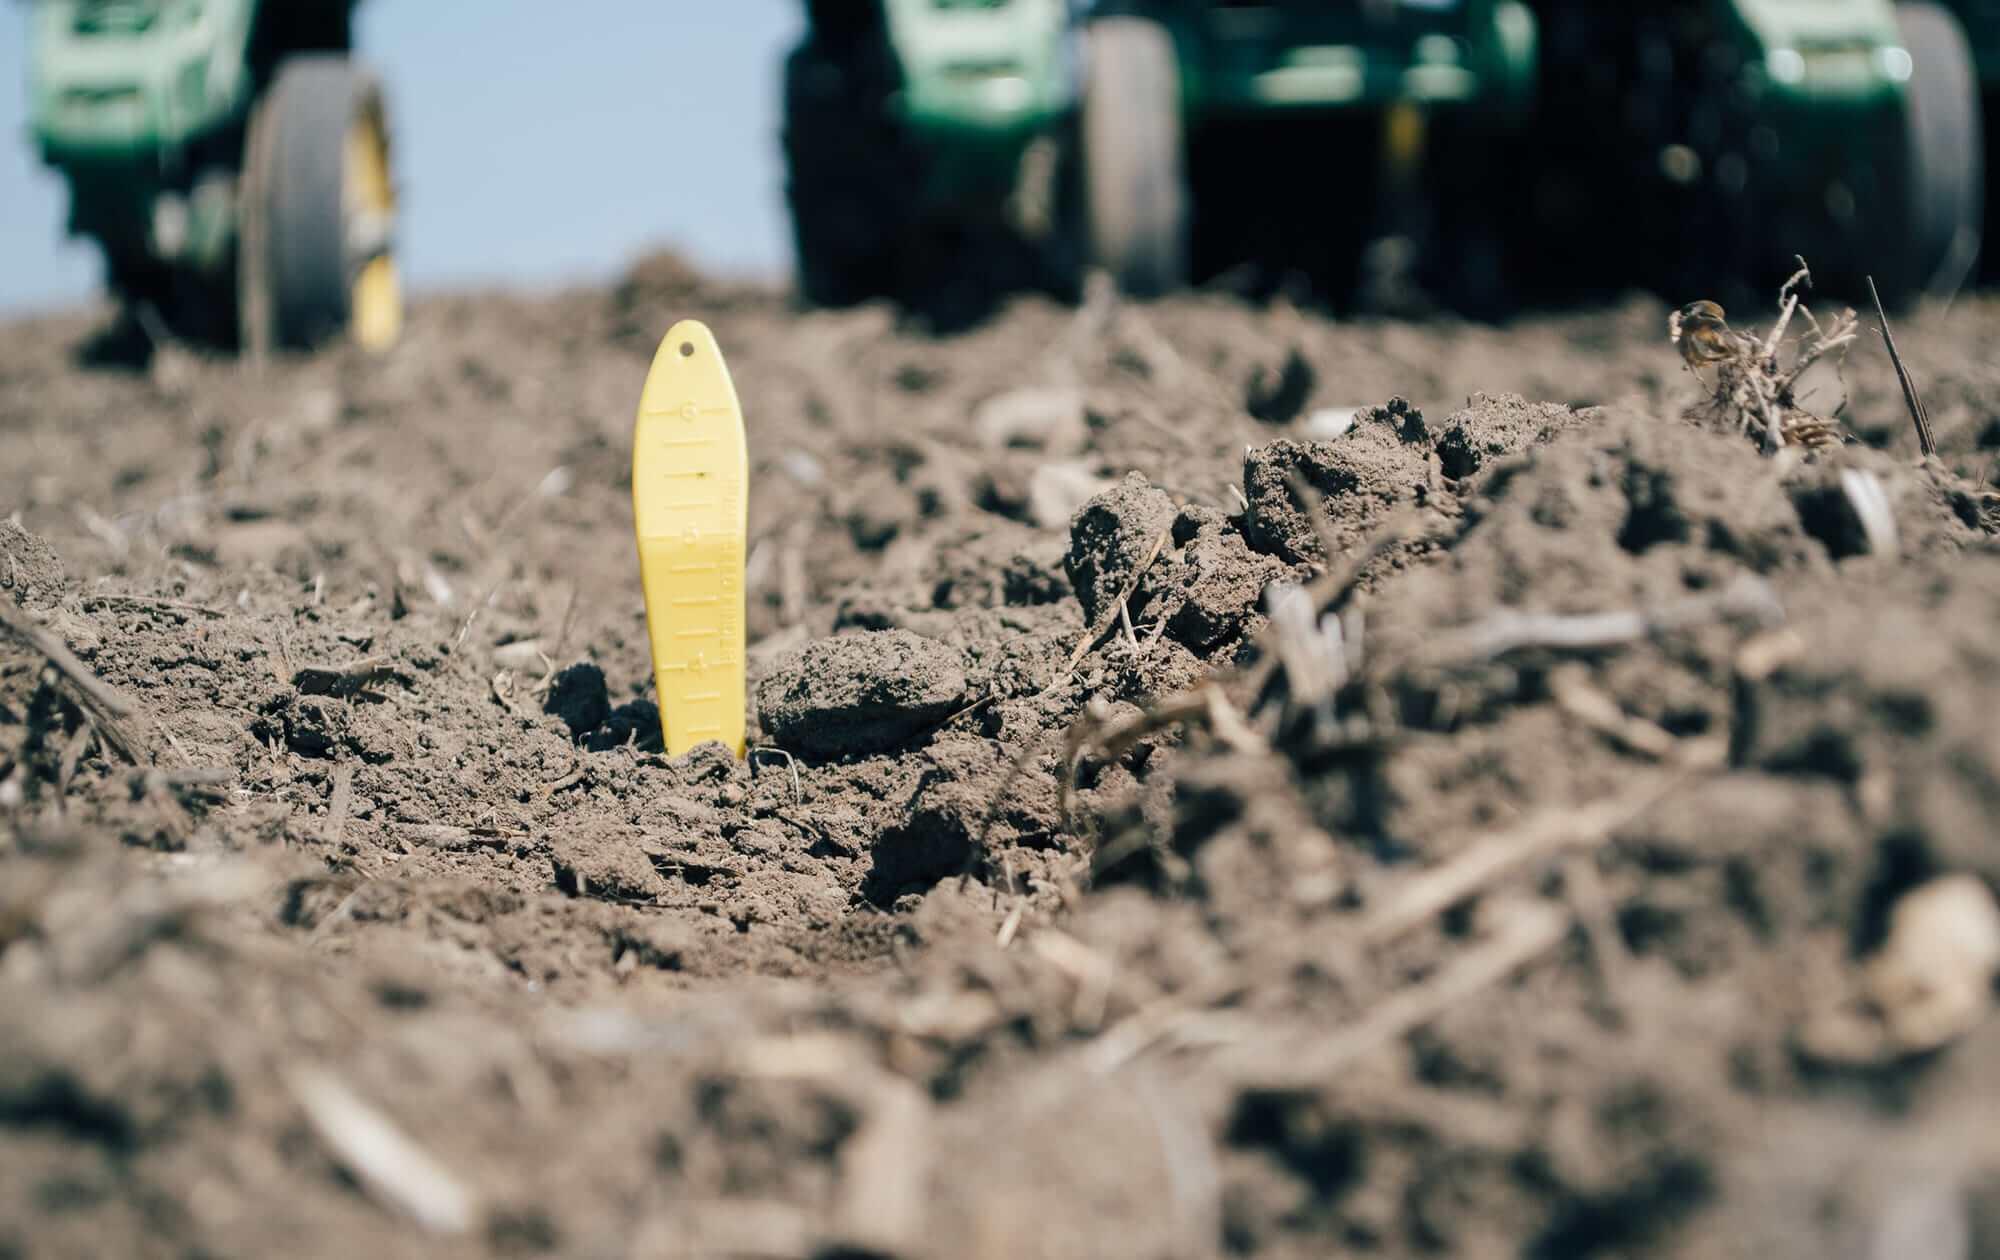 Regenerative farming pulls carbon from air